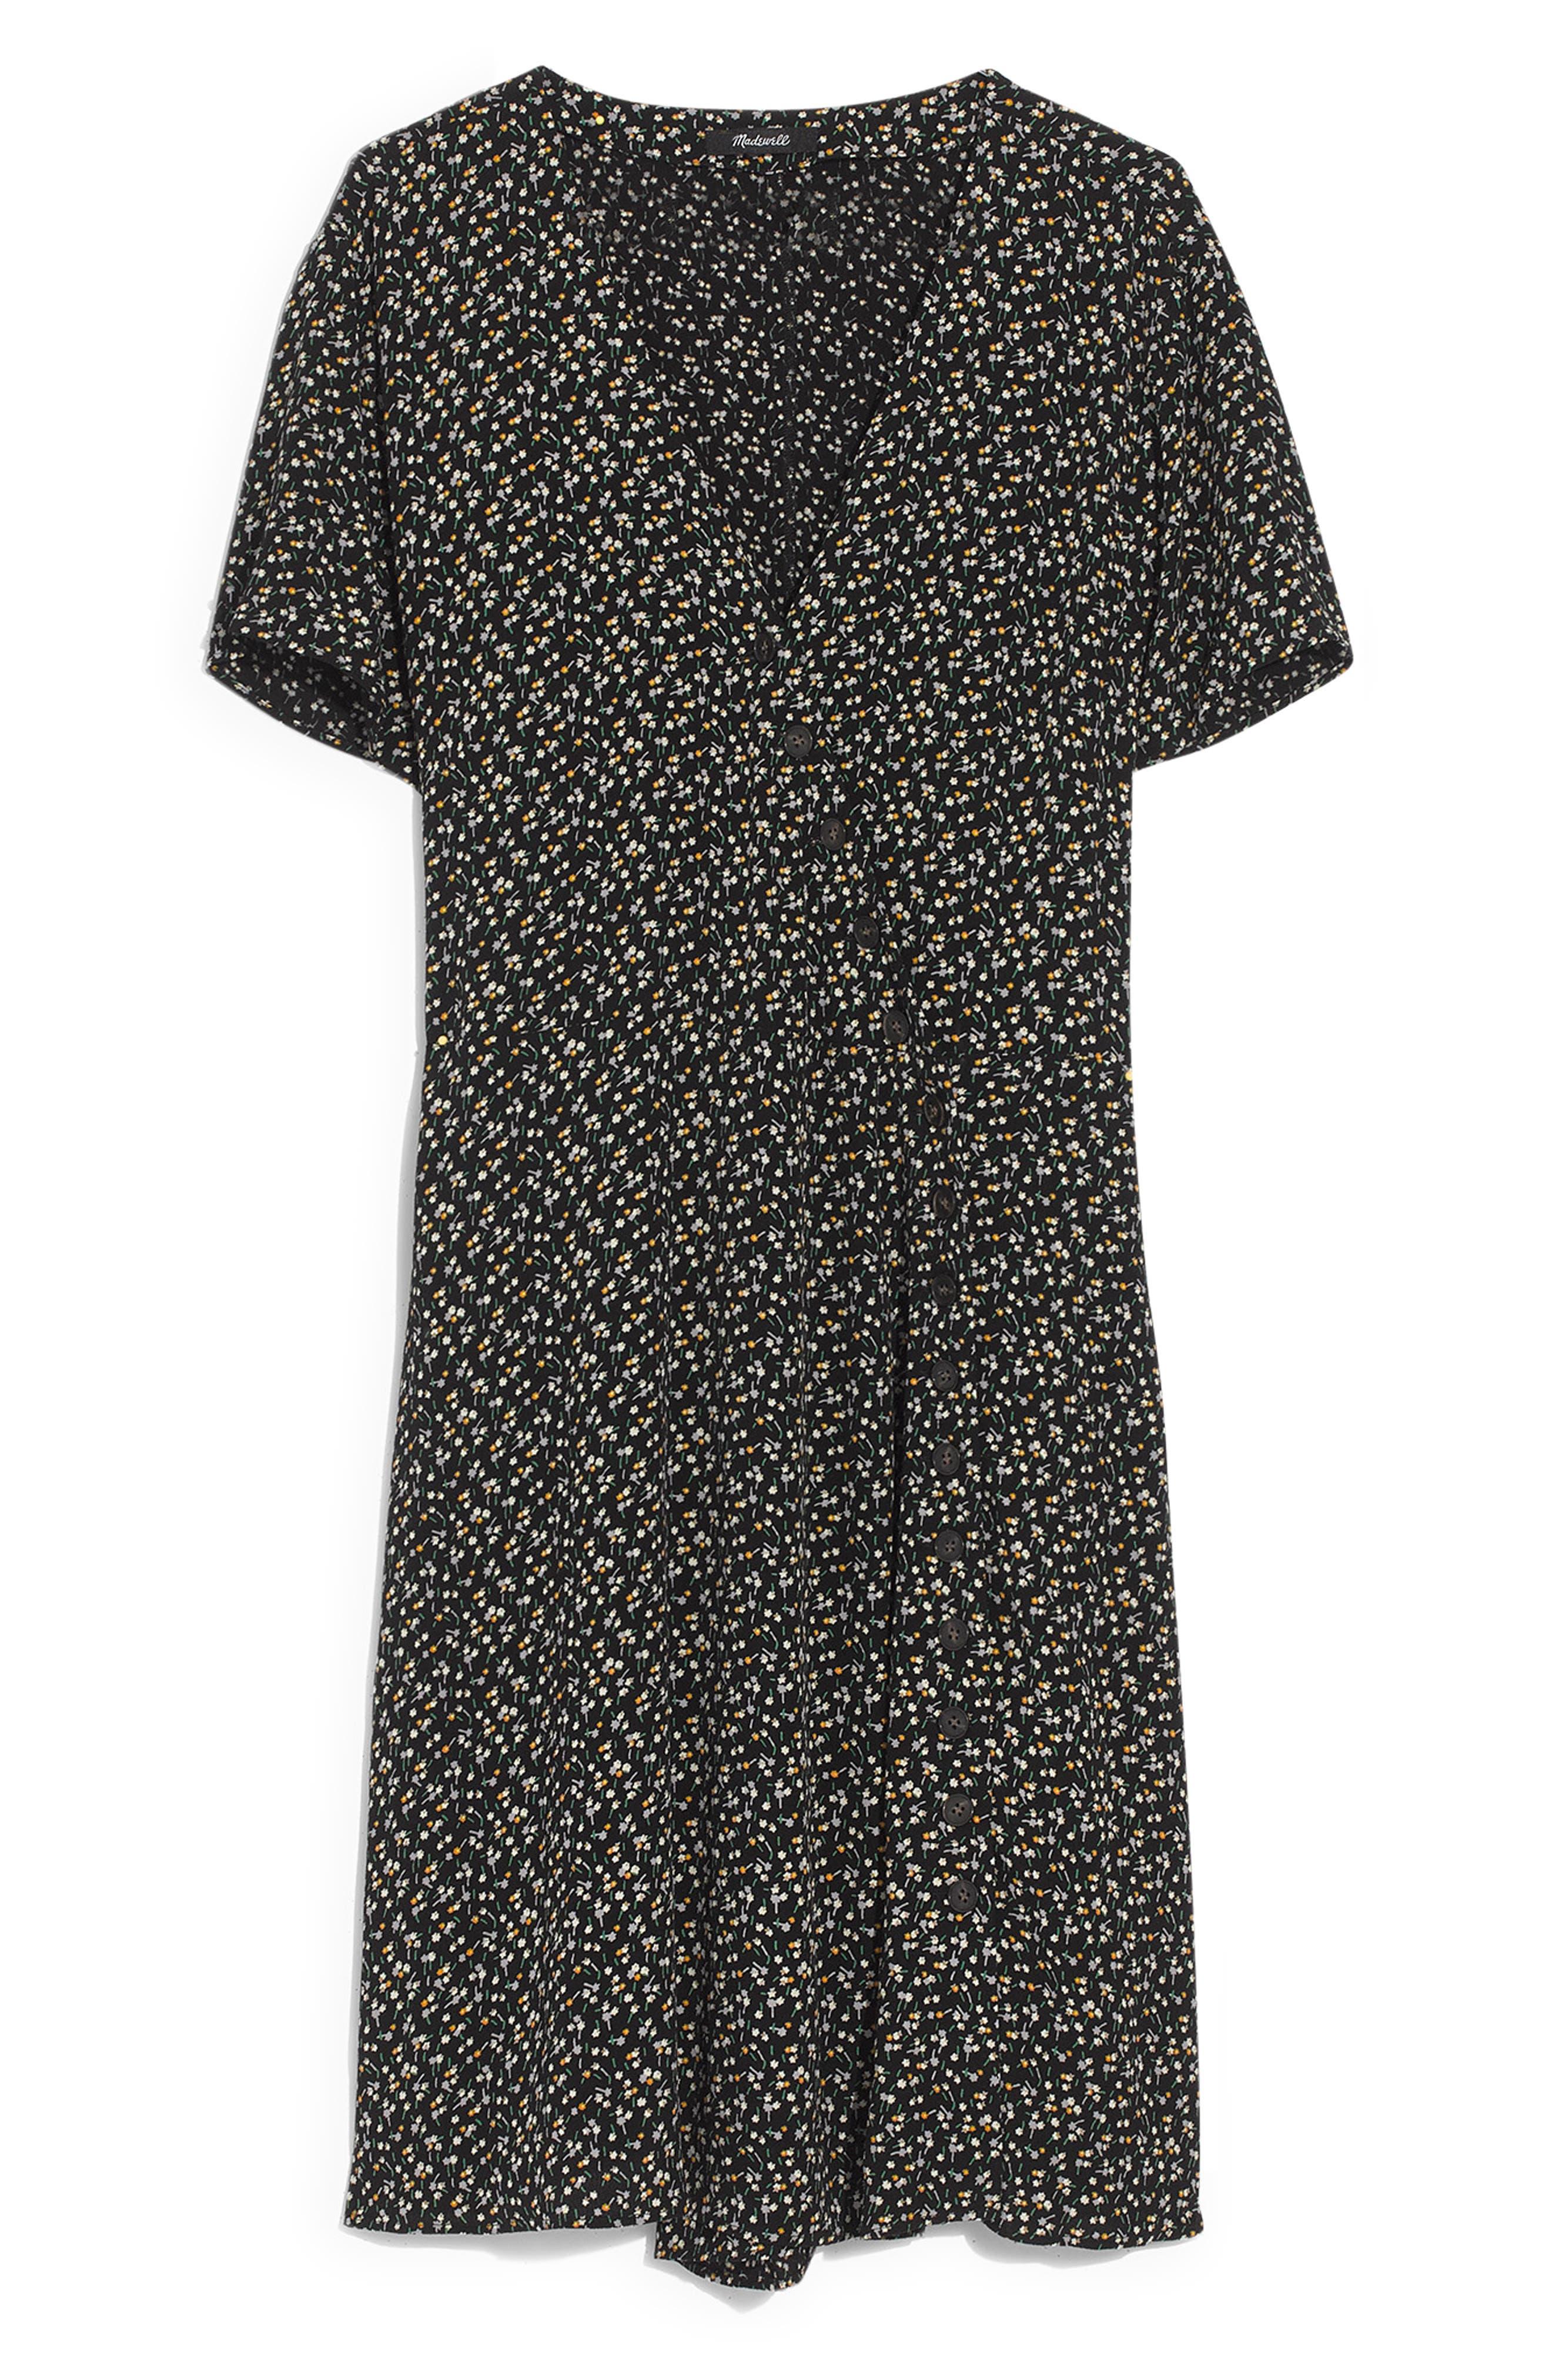 MADEWELL, Button Wrap Dress, Alternate thumbnail 5, color, BLACK FLORAL